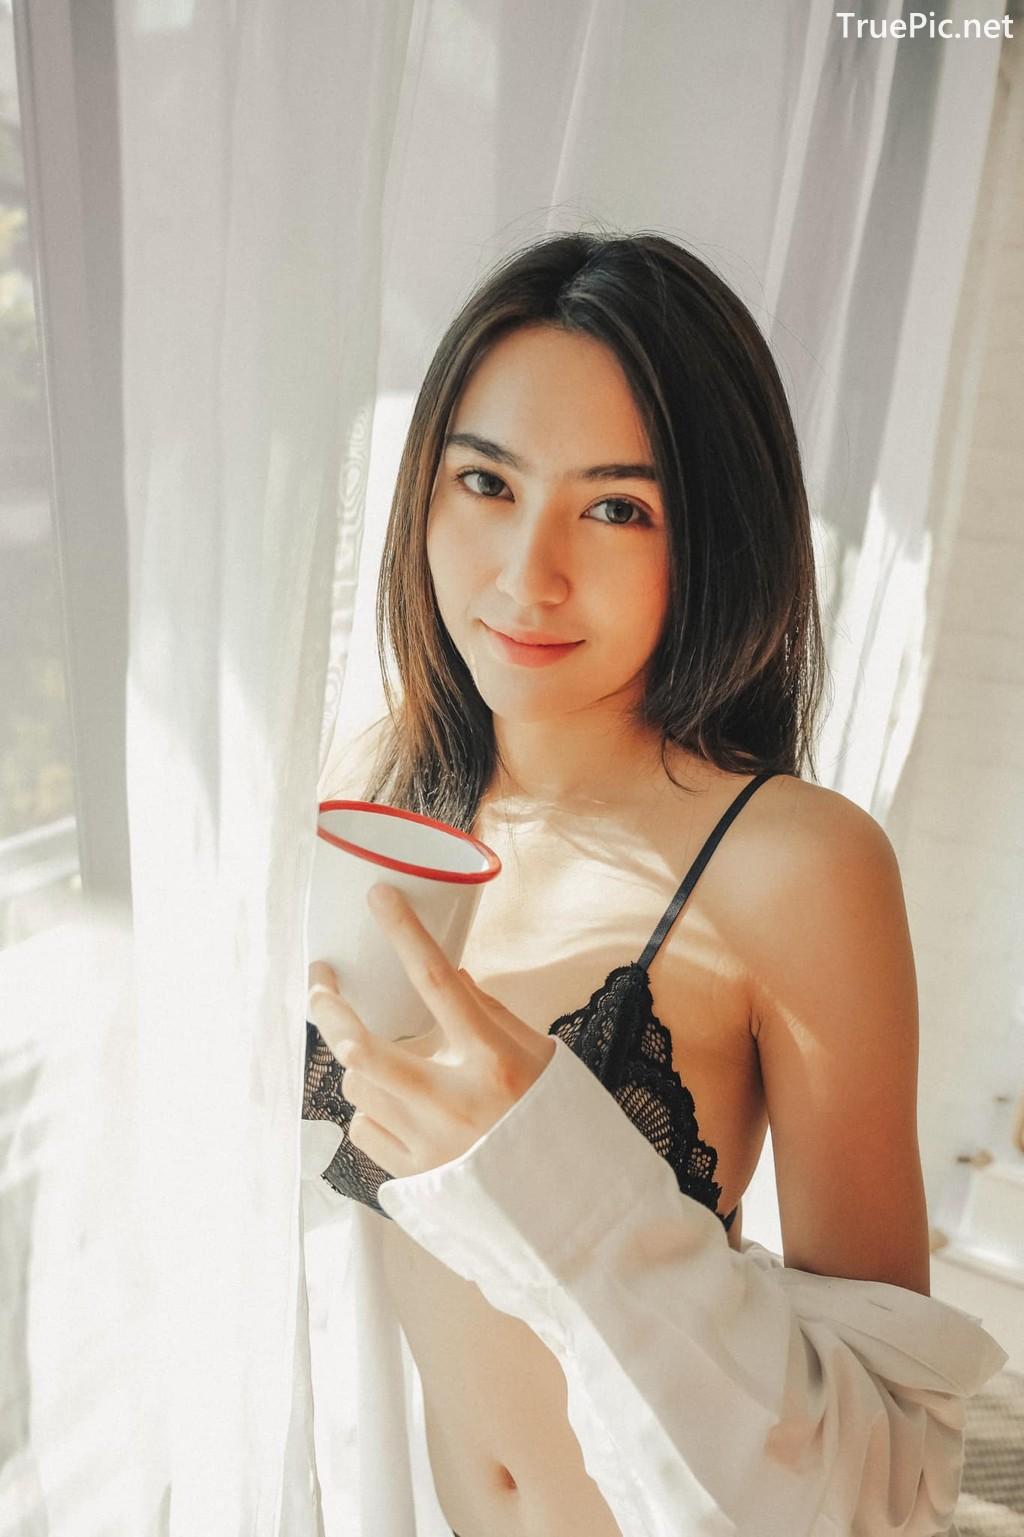 Image Thailand Sexy Model – Baifern Rinrucha Kamnark – Black Lingerie - TruePic.net - Picture-1